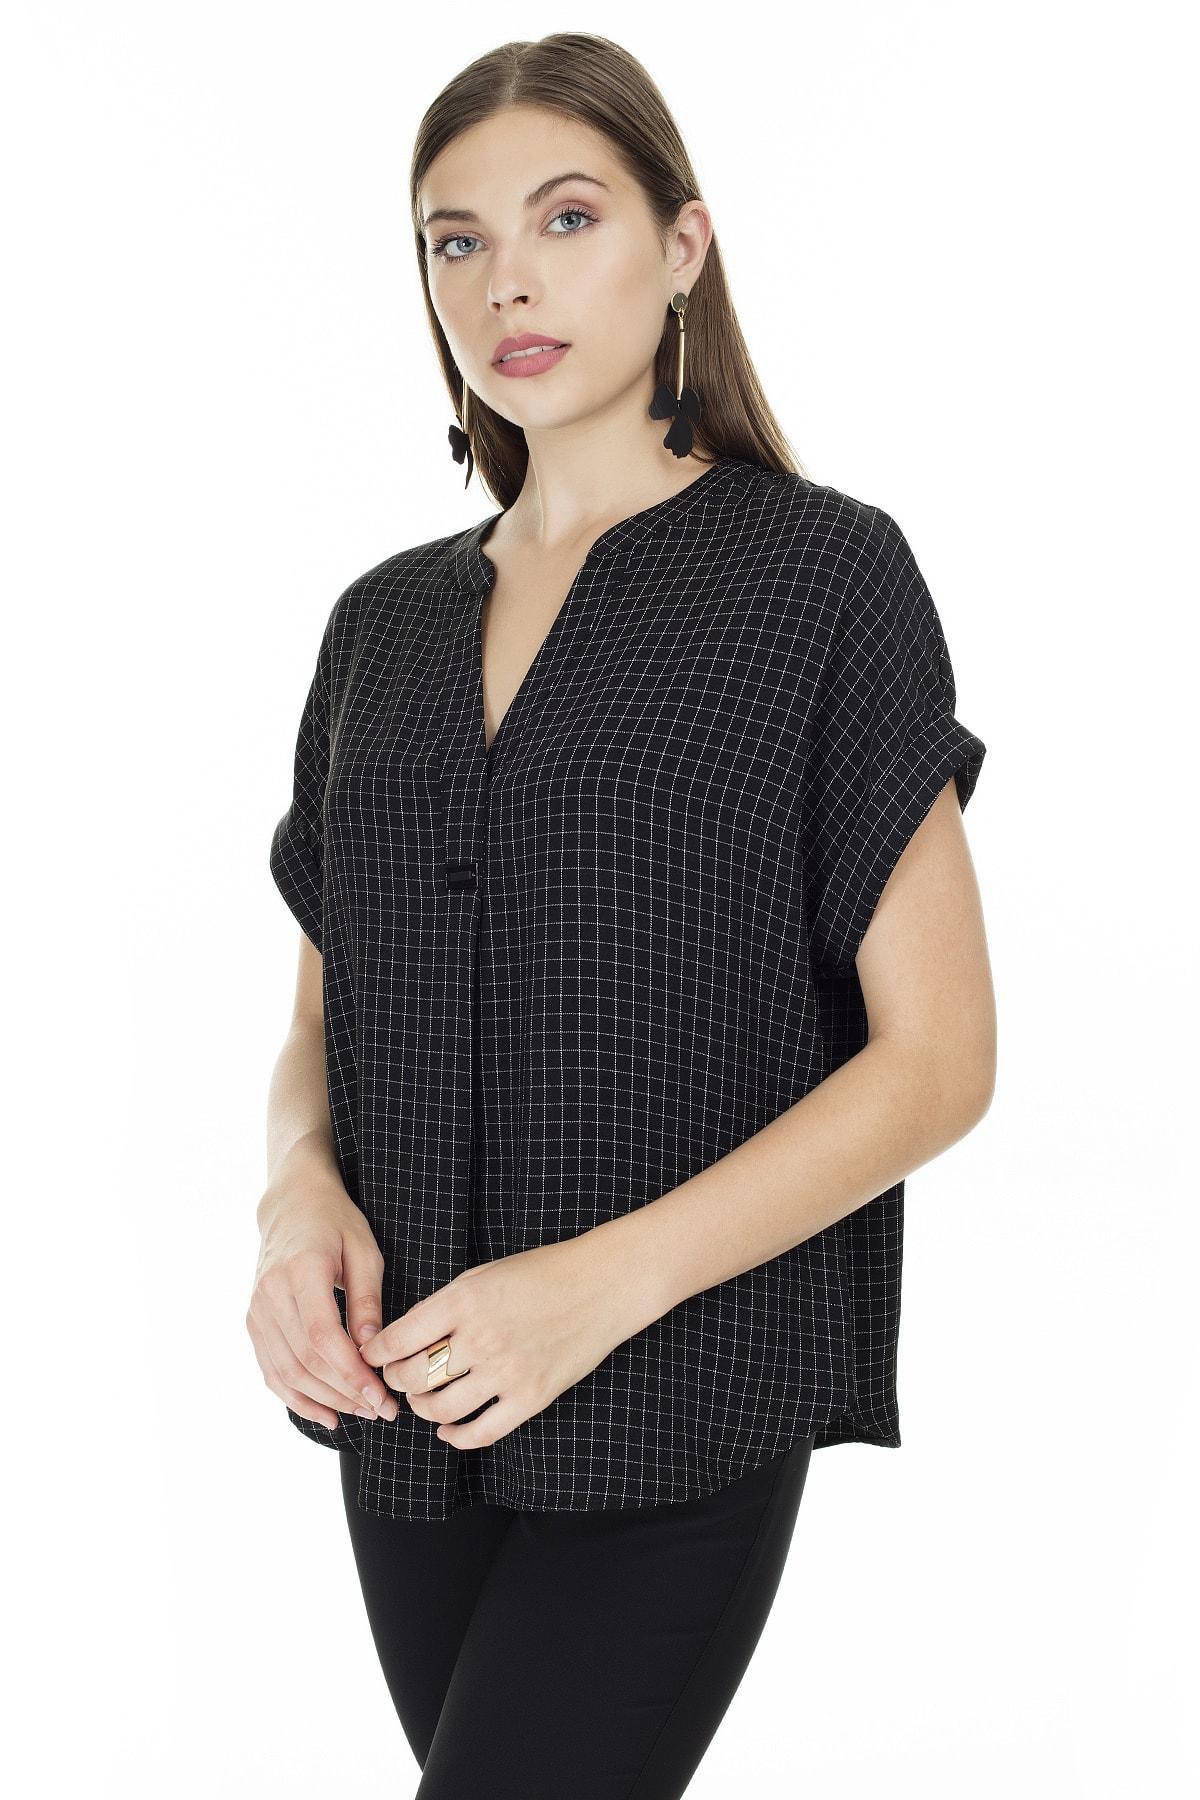 Ayhan Siyah-Ekru Kareli V Yaka Bluz Kadın Bluz 04681405 0